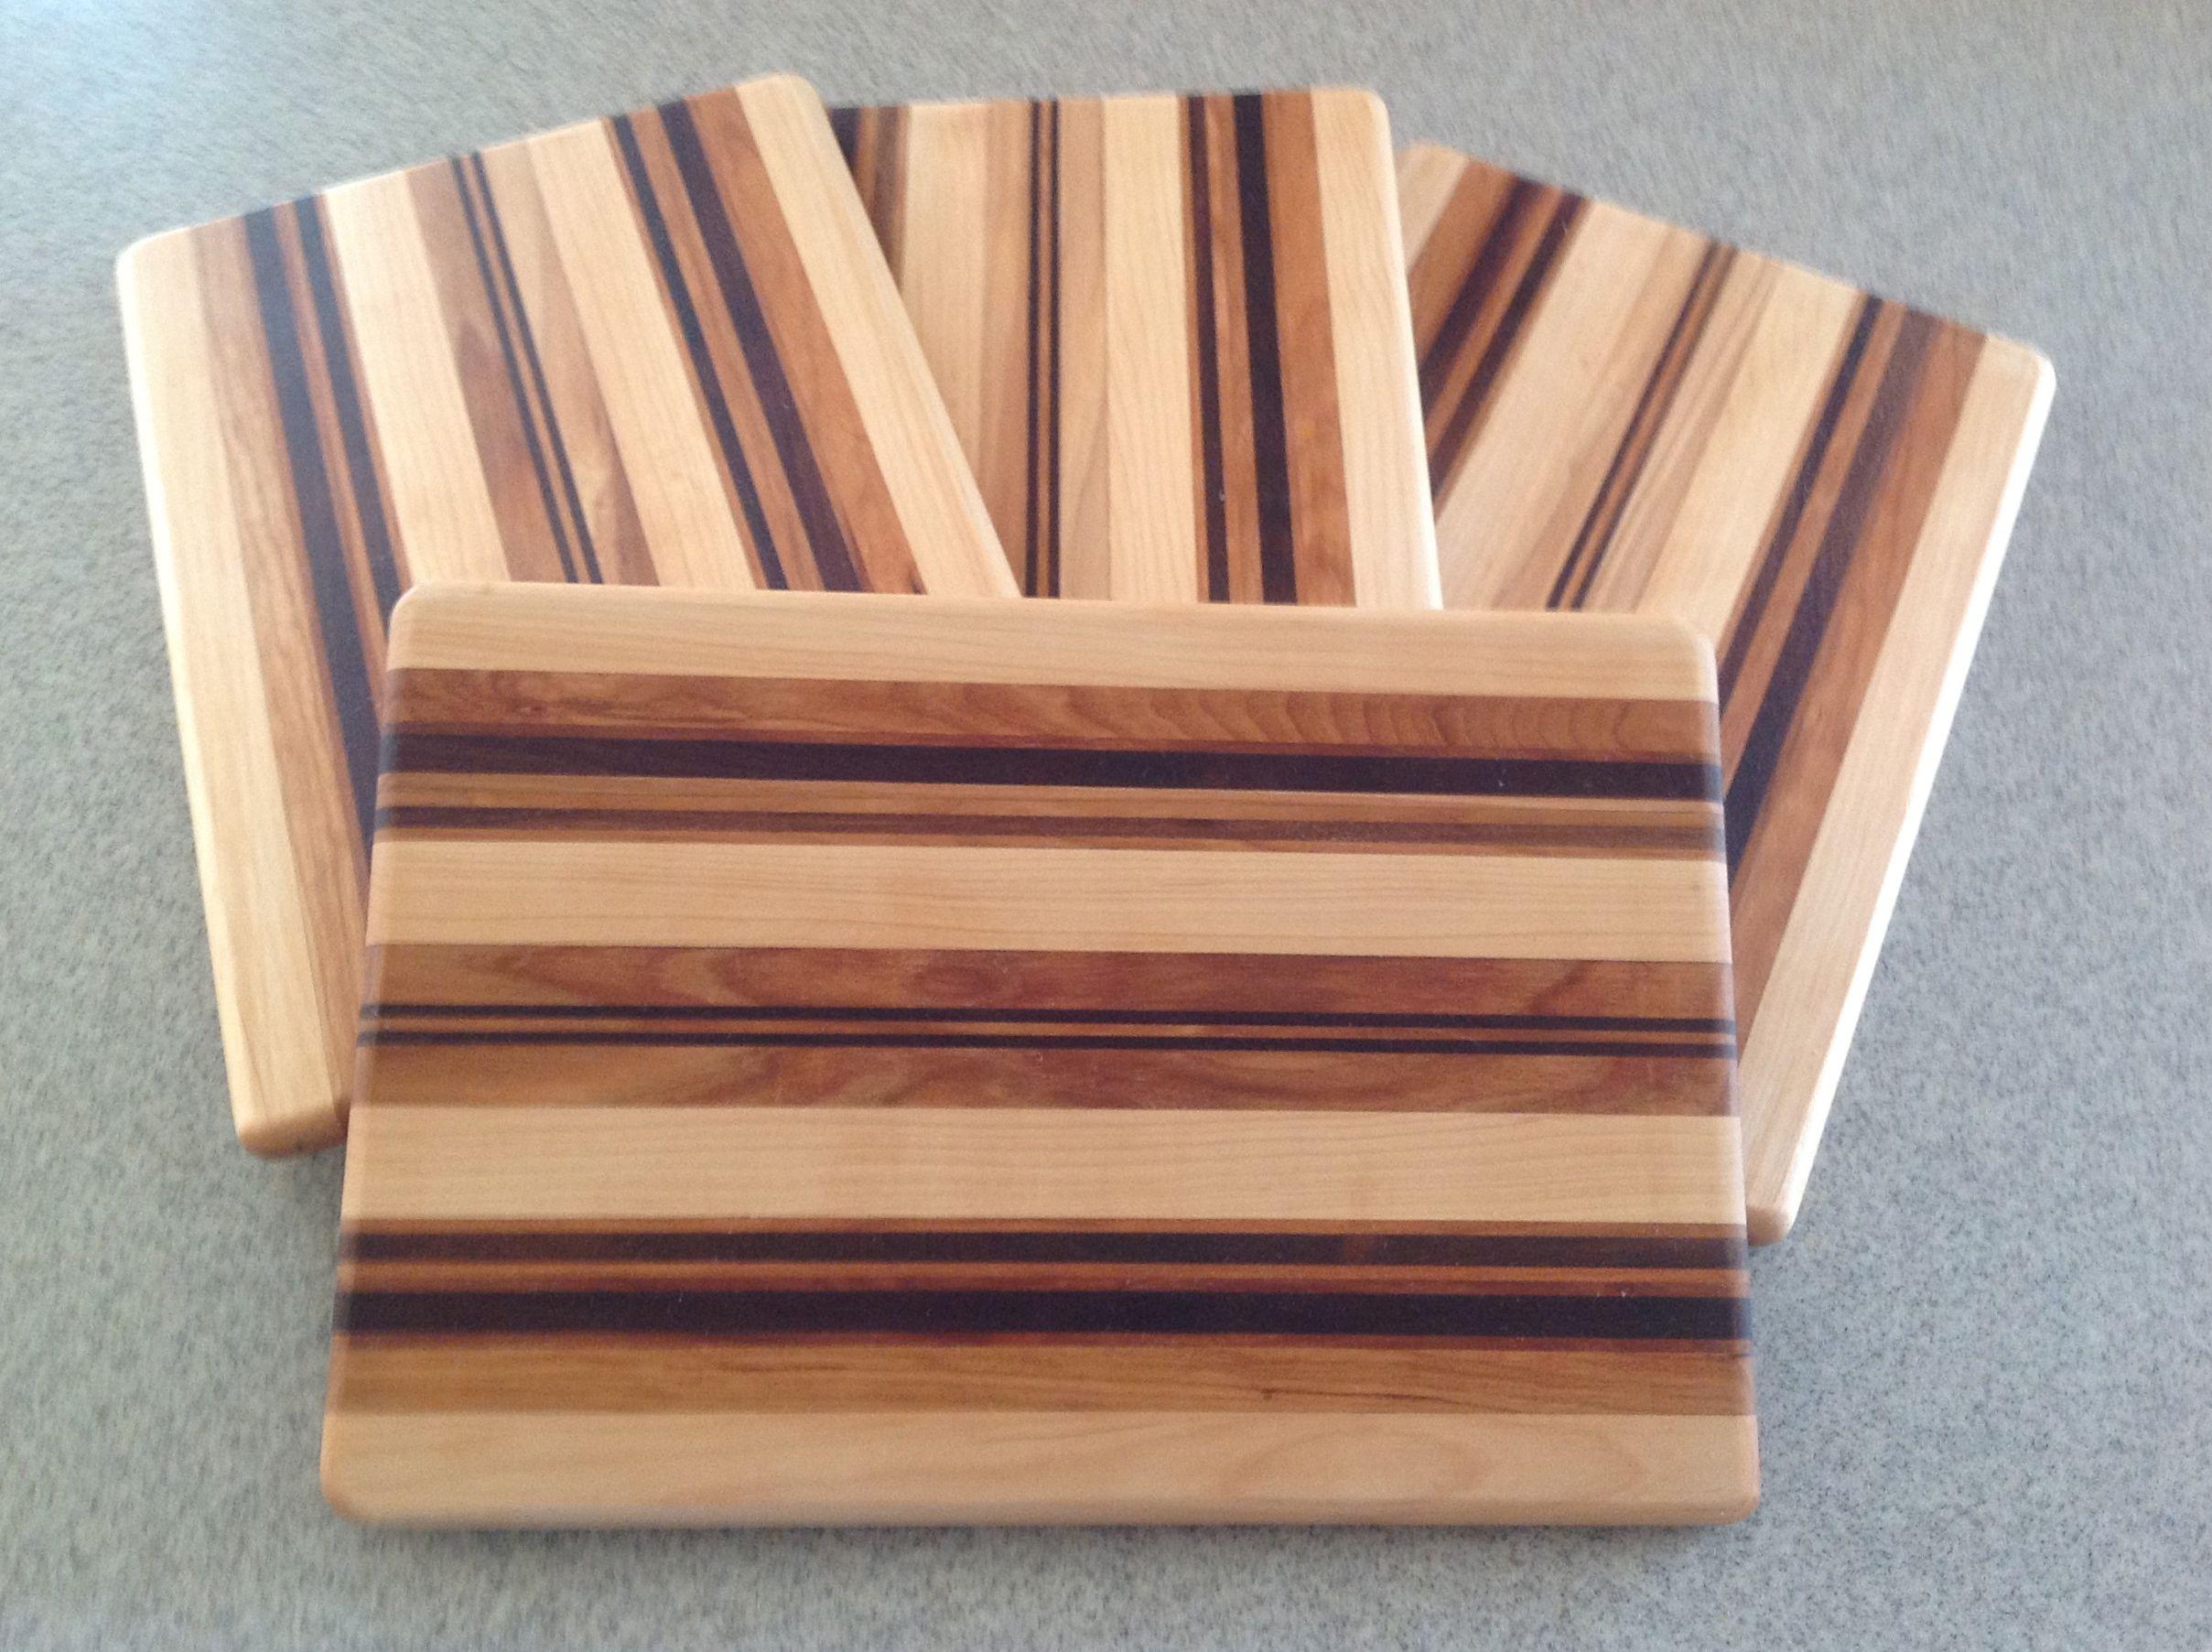 Cutting Boards Finishing Up Dan In Focus